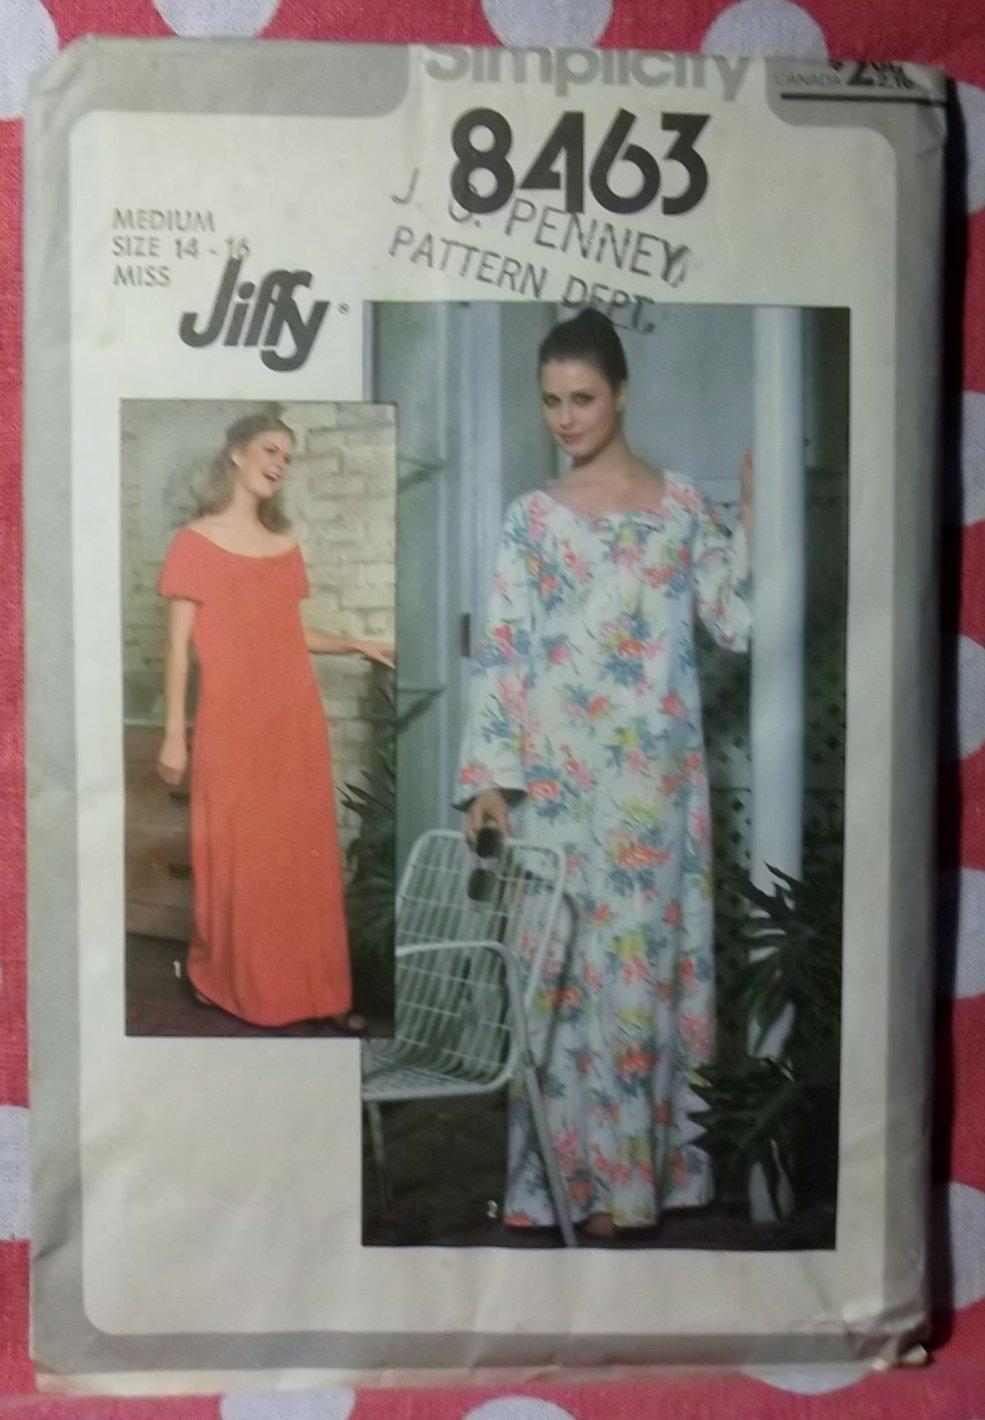 Vintage 70s Jiffy Simplicity 8463 Caftan, Muu Muu or Dress Pattern Sz Md 14-16, Uncut